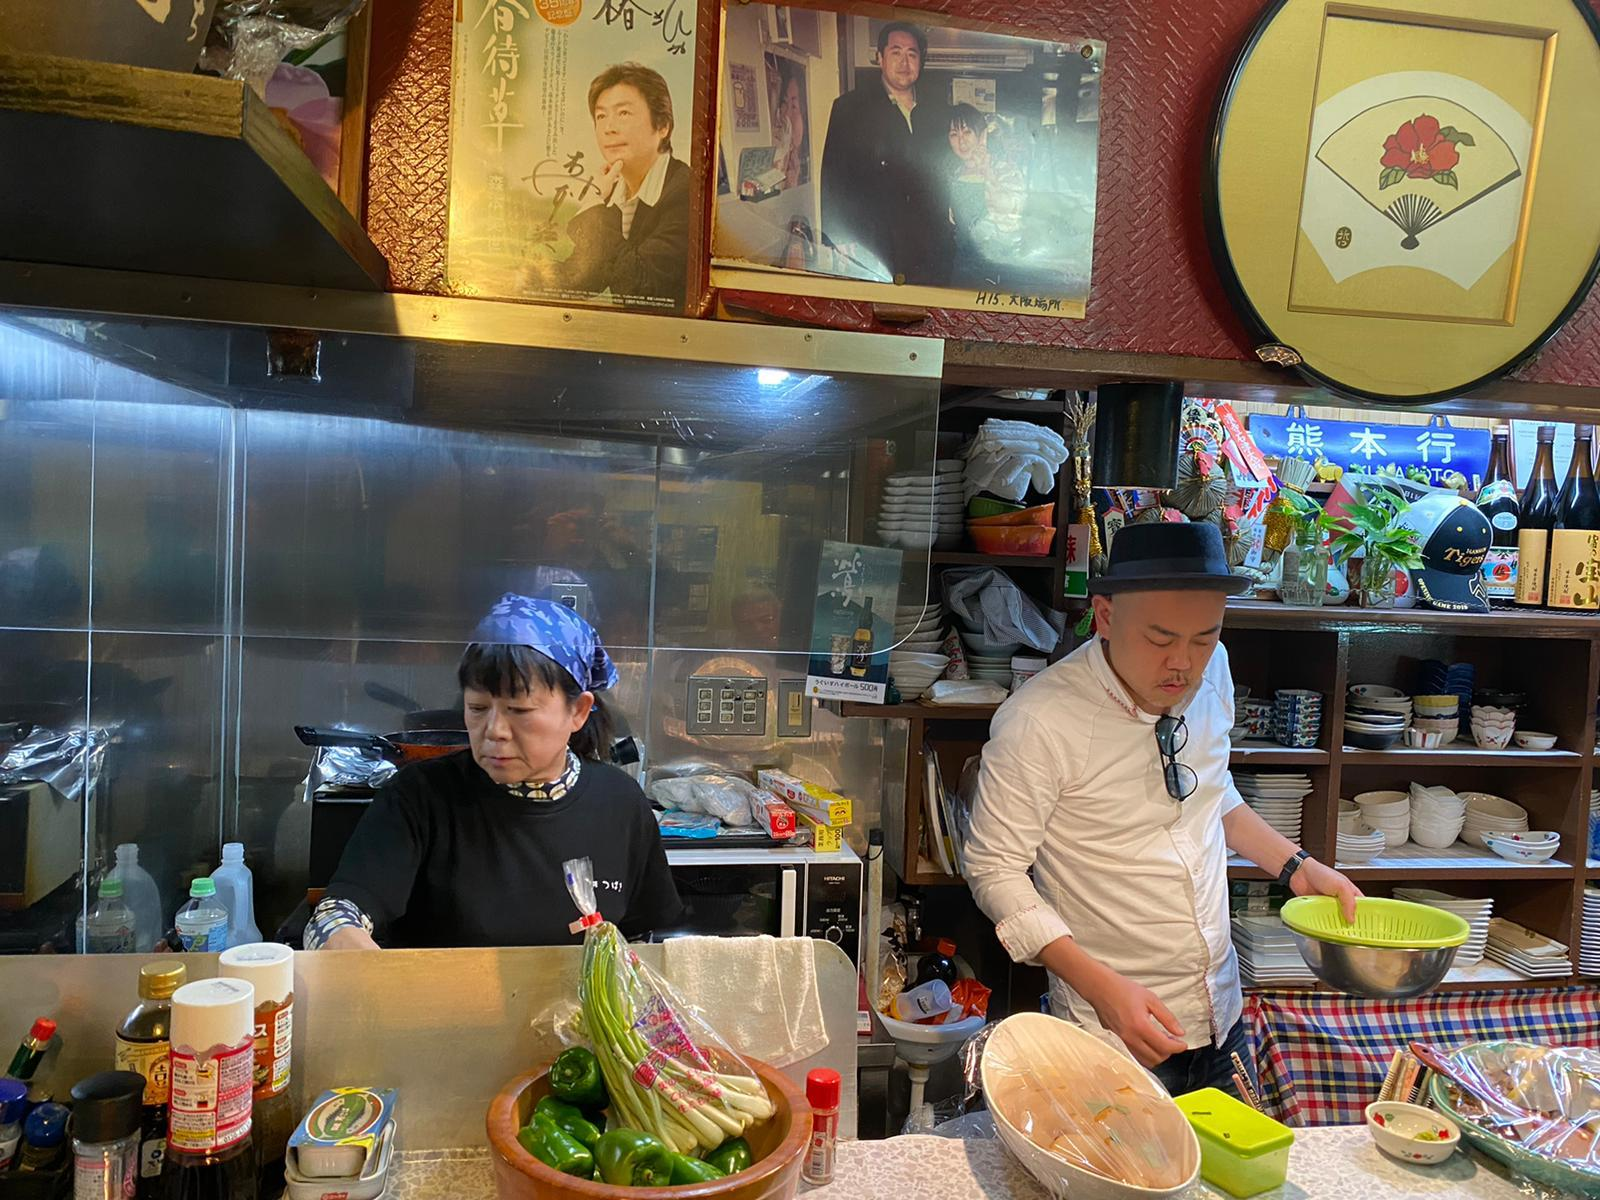 Ryota Kanesawa and his mother cooking at her kushikatsu restaurant (Photo: Ryota Kanesawa)